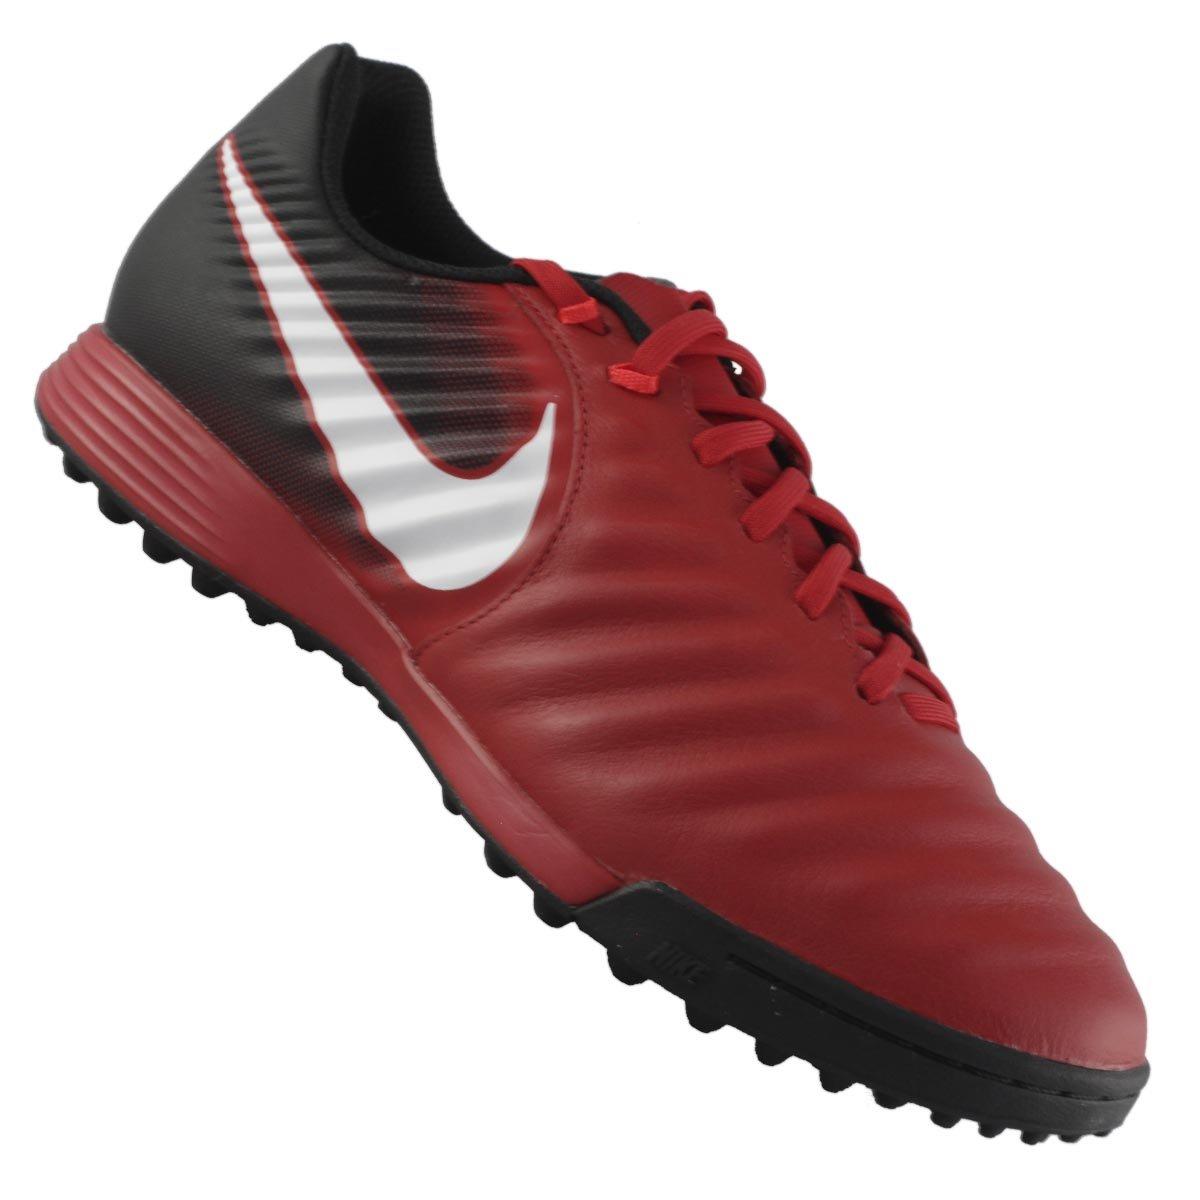 b03f0735a4104 Chuteira Society Nike Tiempo Ligera IV TF